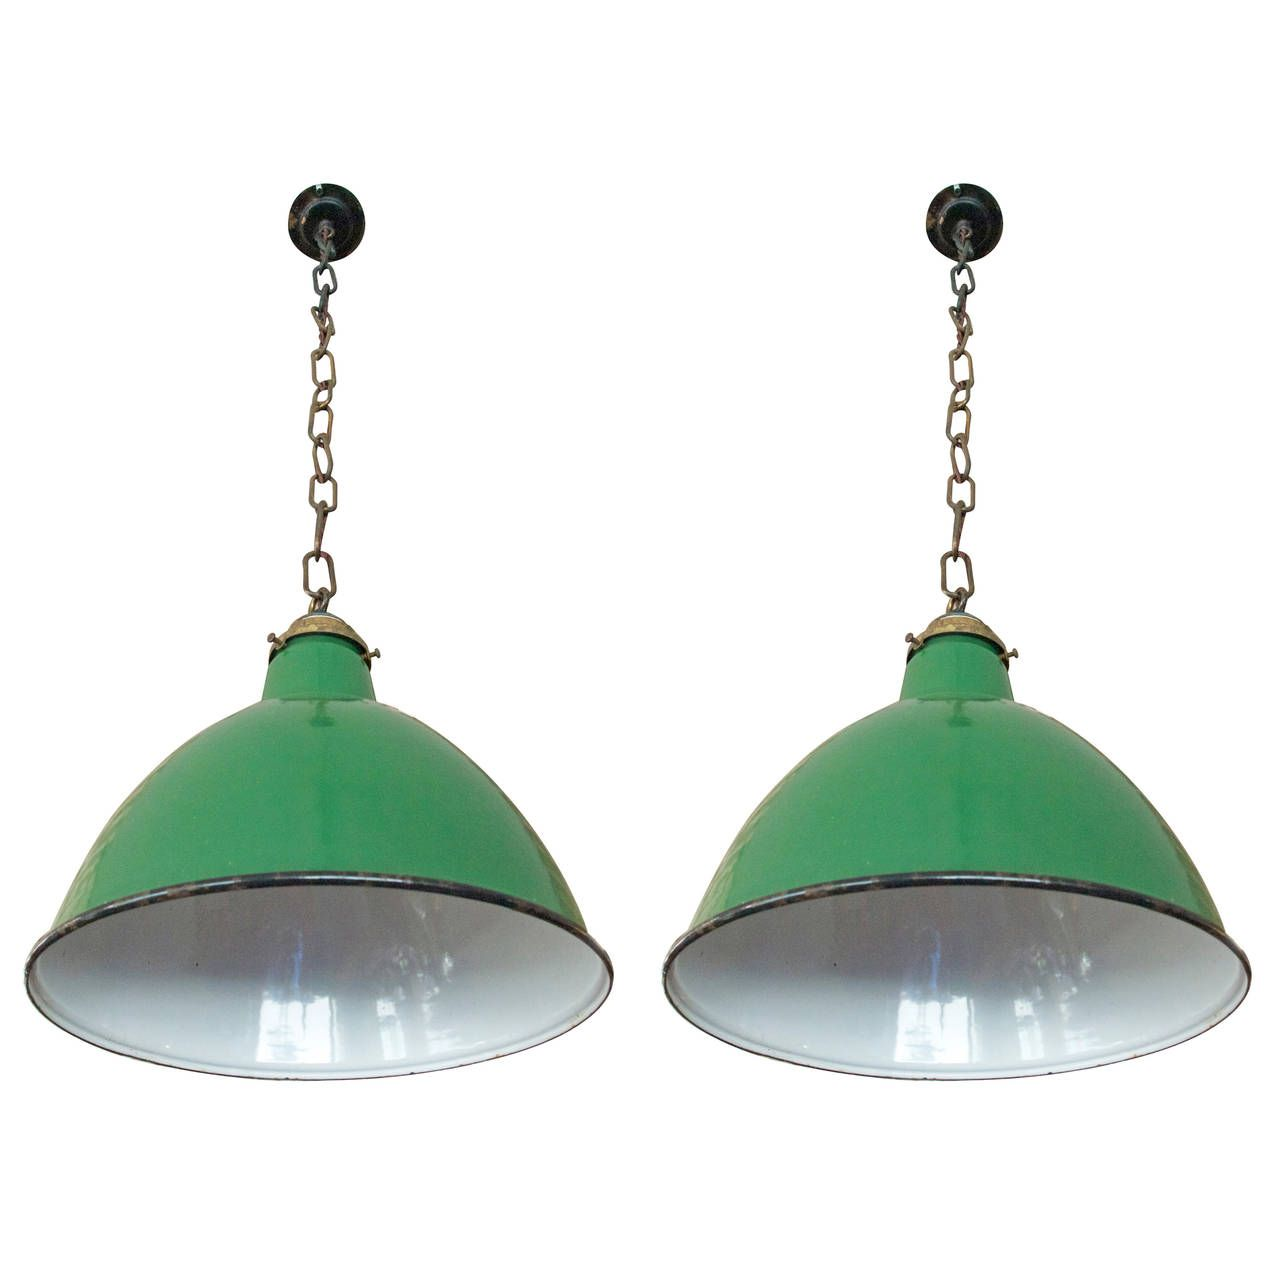 Pair of Mid Century Industrial Lights | 1stdibs.com